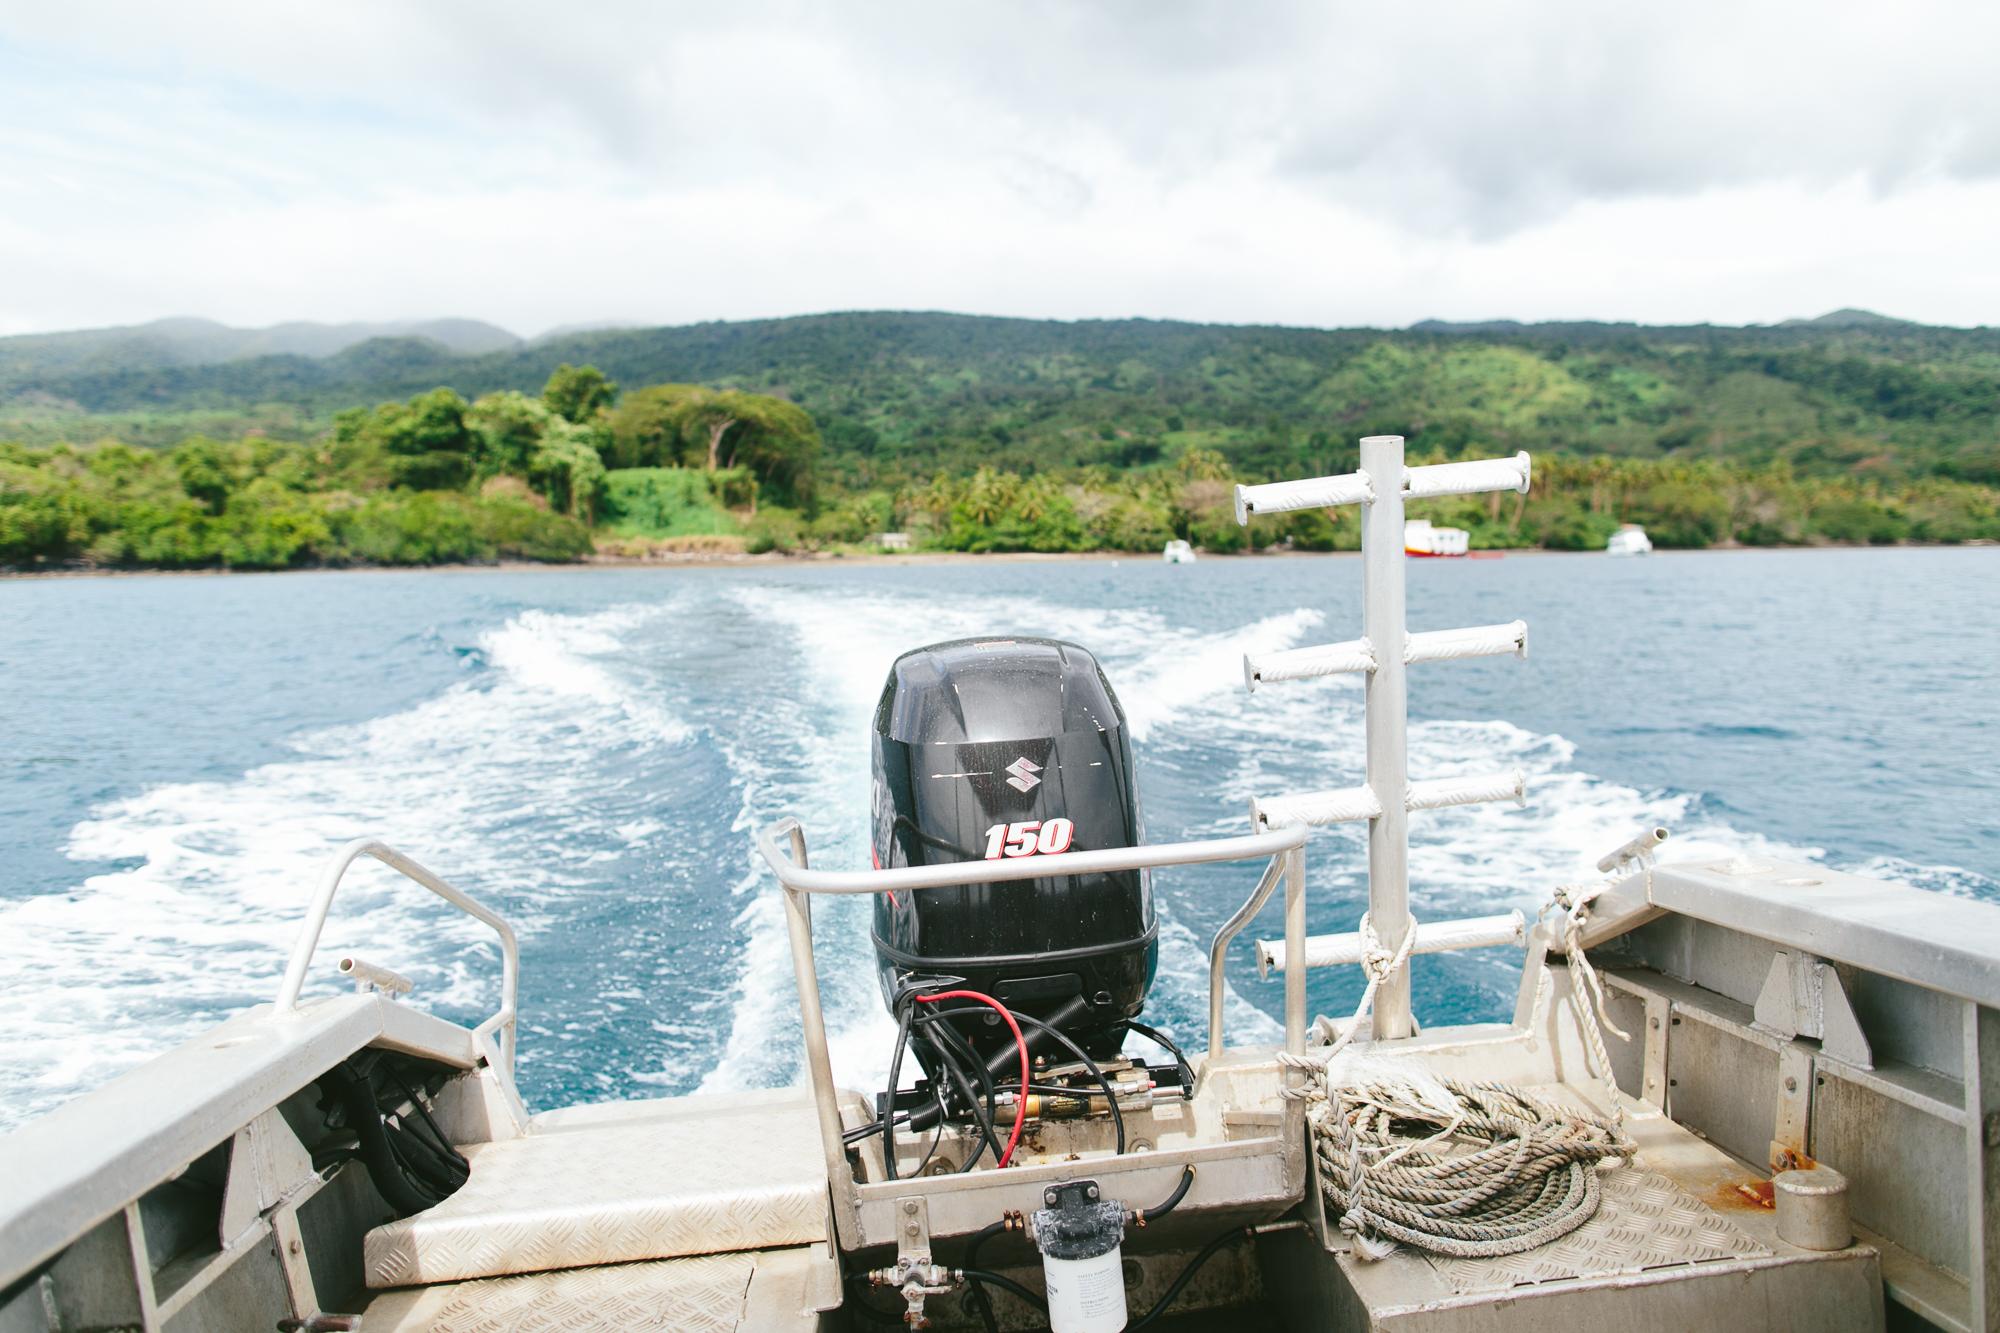 Taveuni Boat Transfer to The Remote Resort Fiji Islands